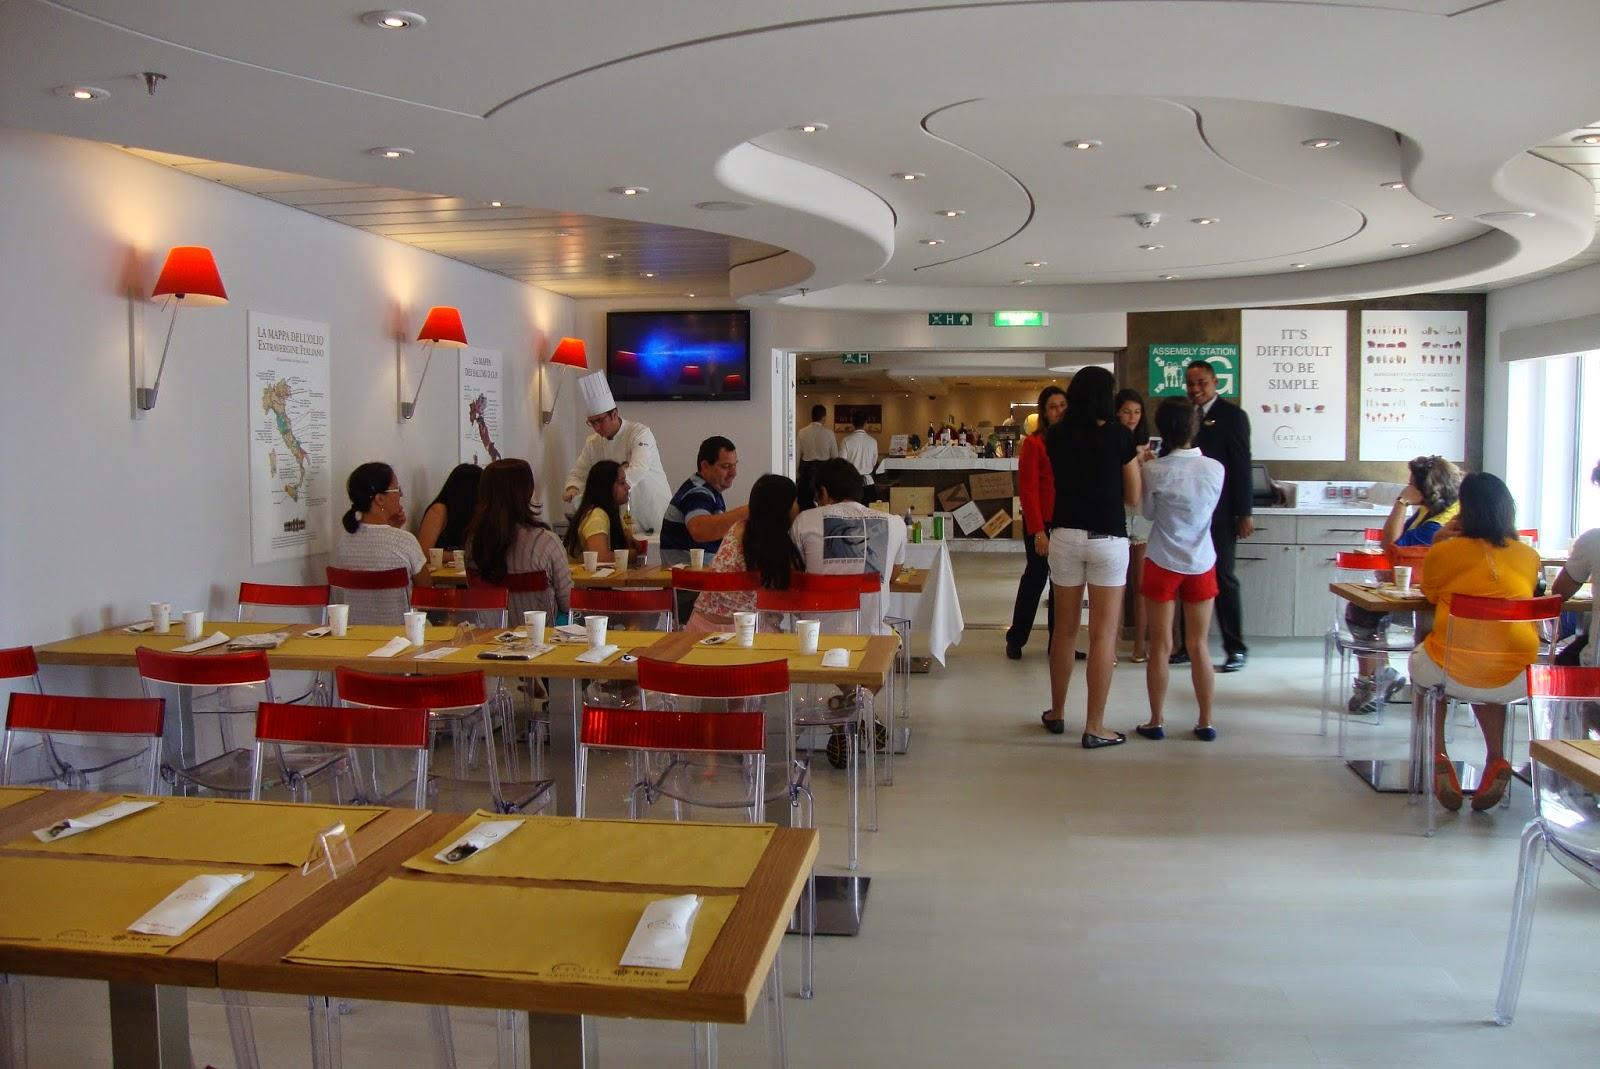 Restaurante Eataly no MSC Preziosa